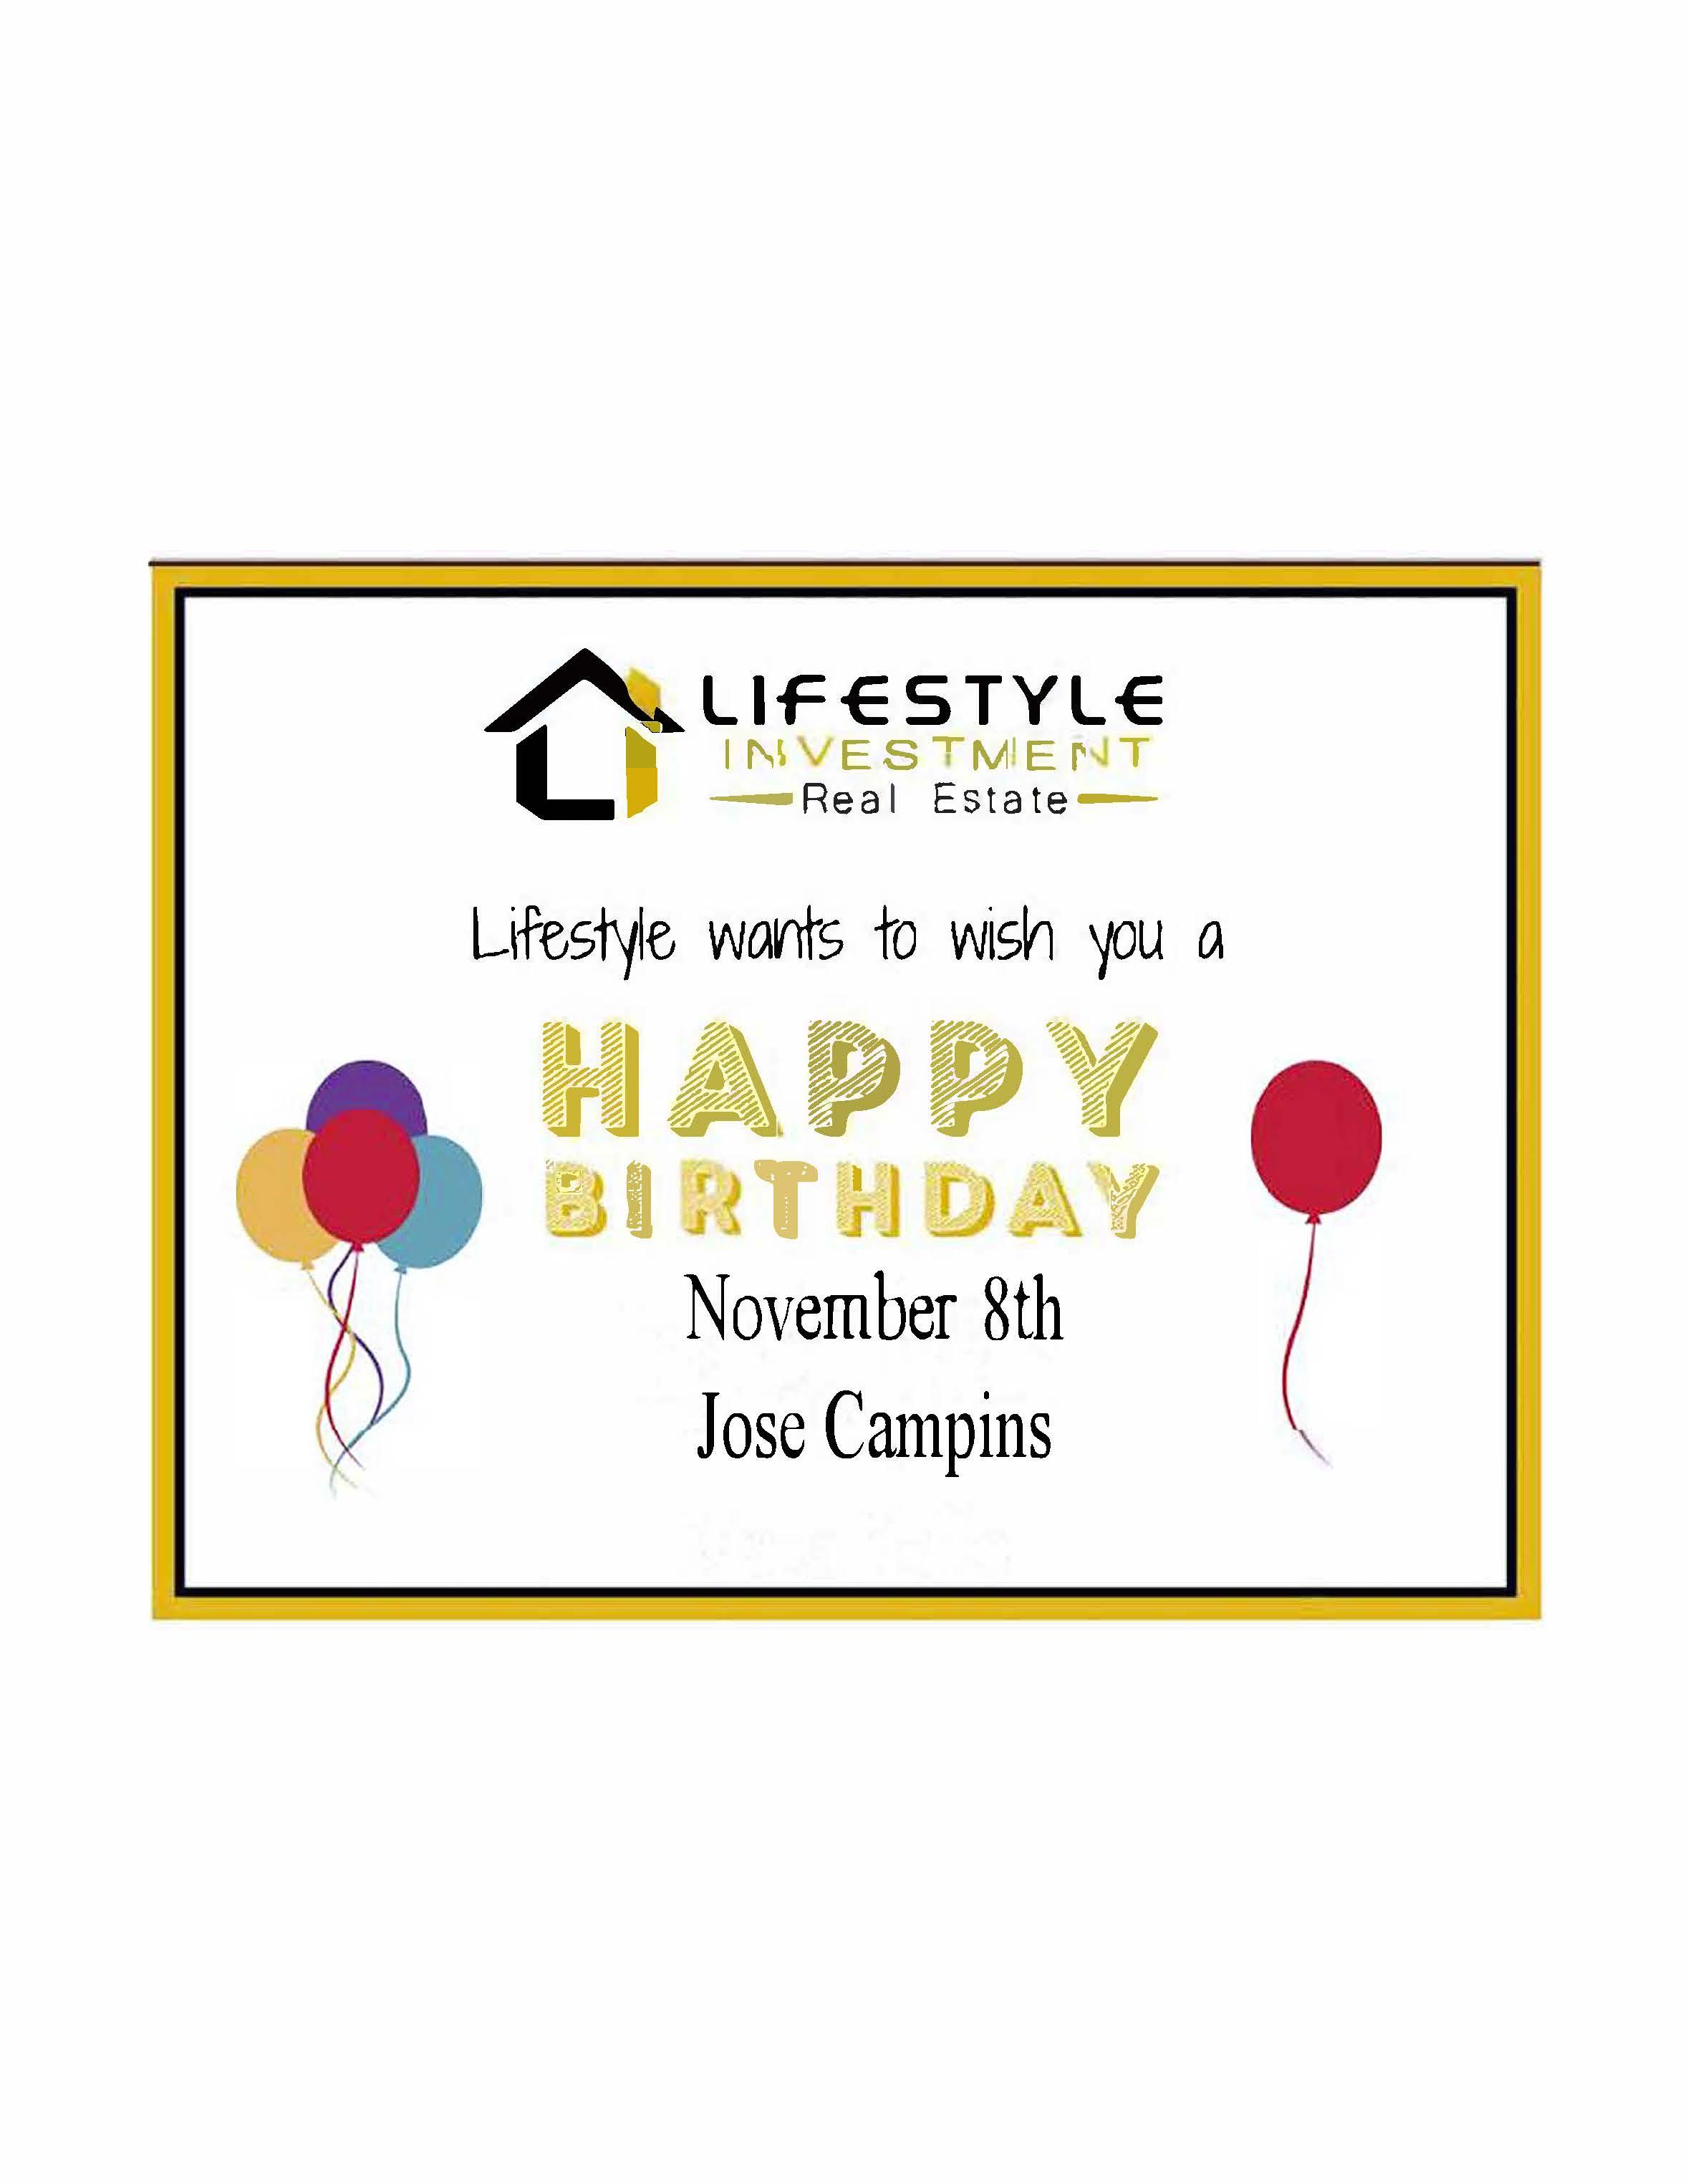 Jose Campins Birthday